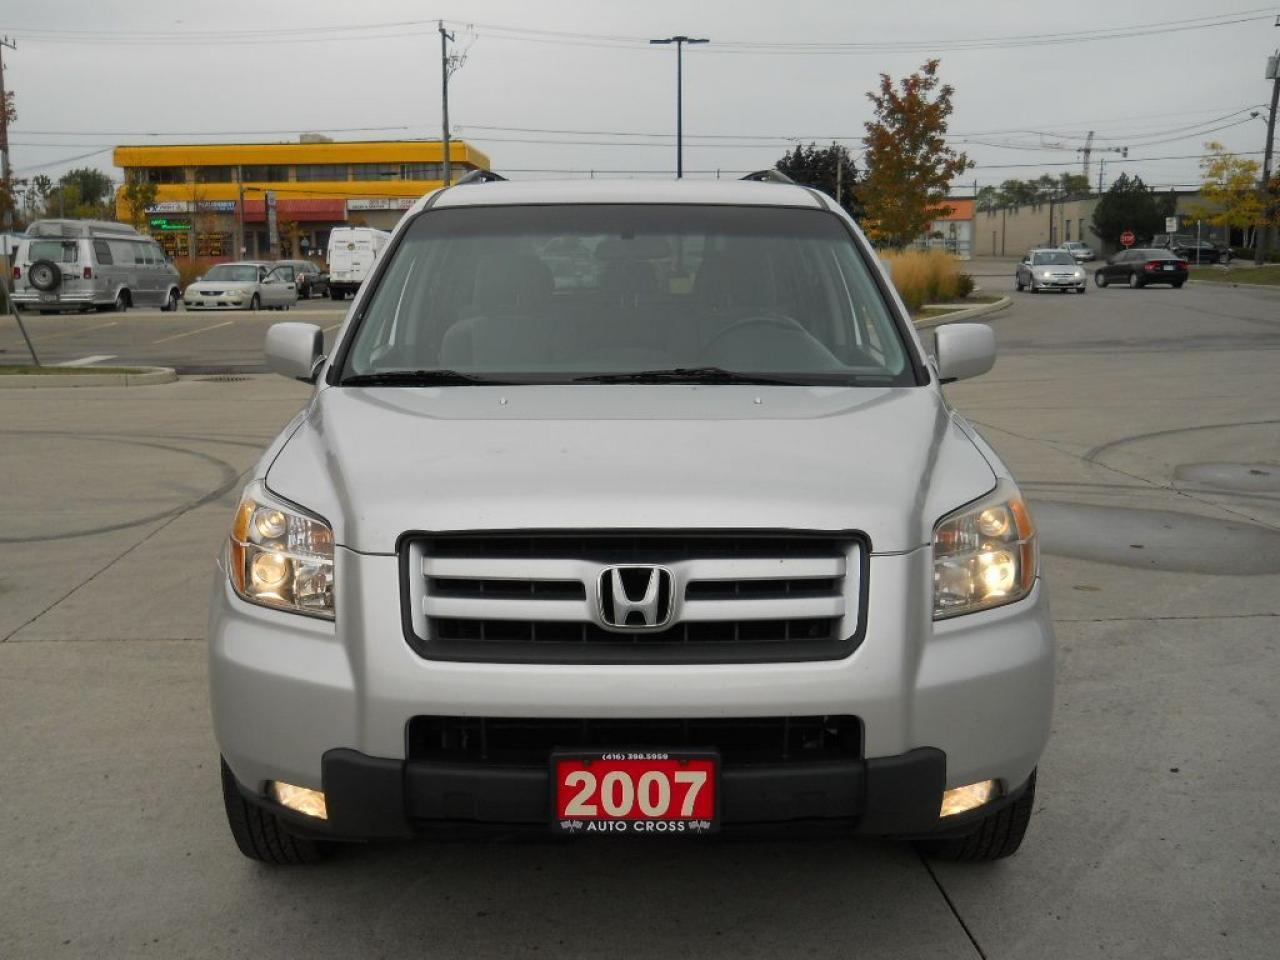 2007 Honda Pilot 8 passenger, 4WD, Automatic, 3/Y warranty availabl